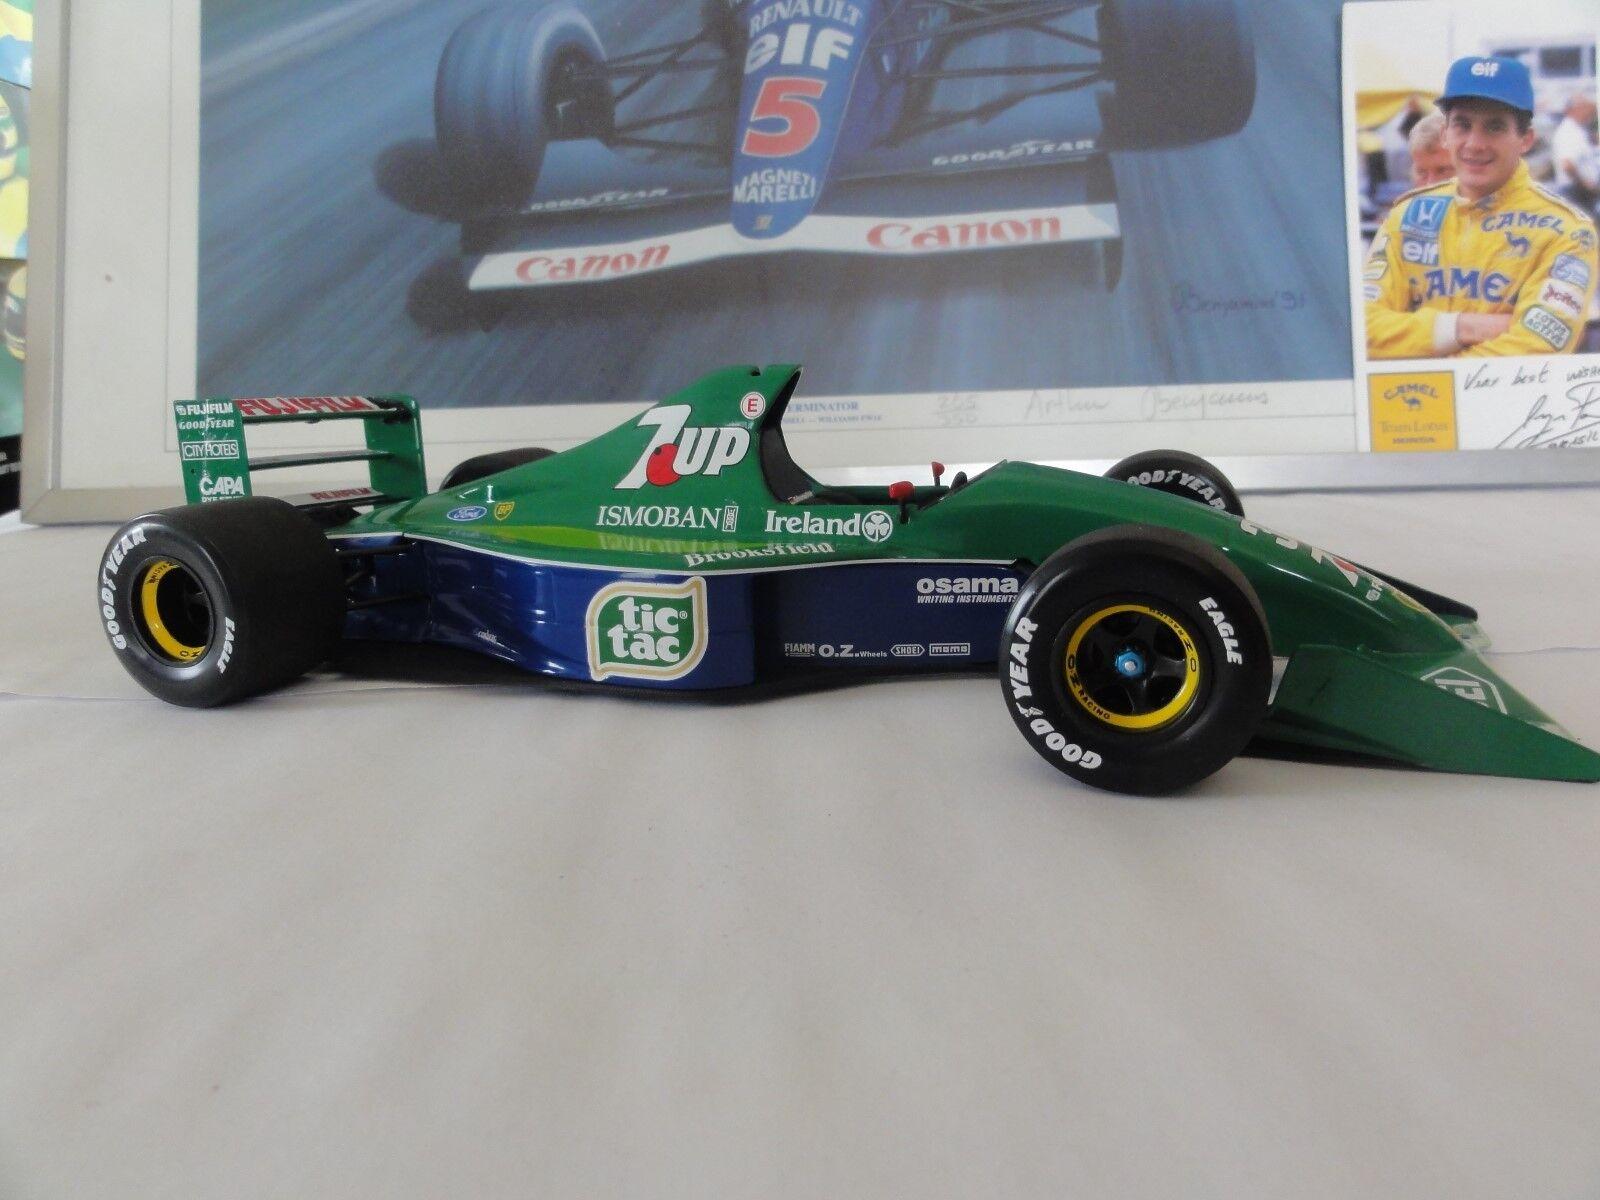 Minichamps 1:18 Michael Schumacher Schumacher Schumacher Jordan 191 GP DE BELGIQUE SPA F1 1991 | Soldes  521d25